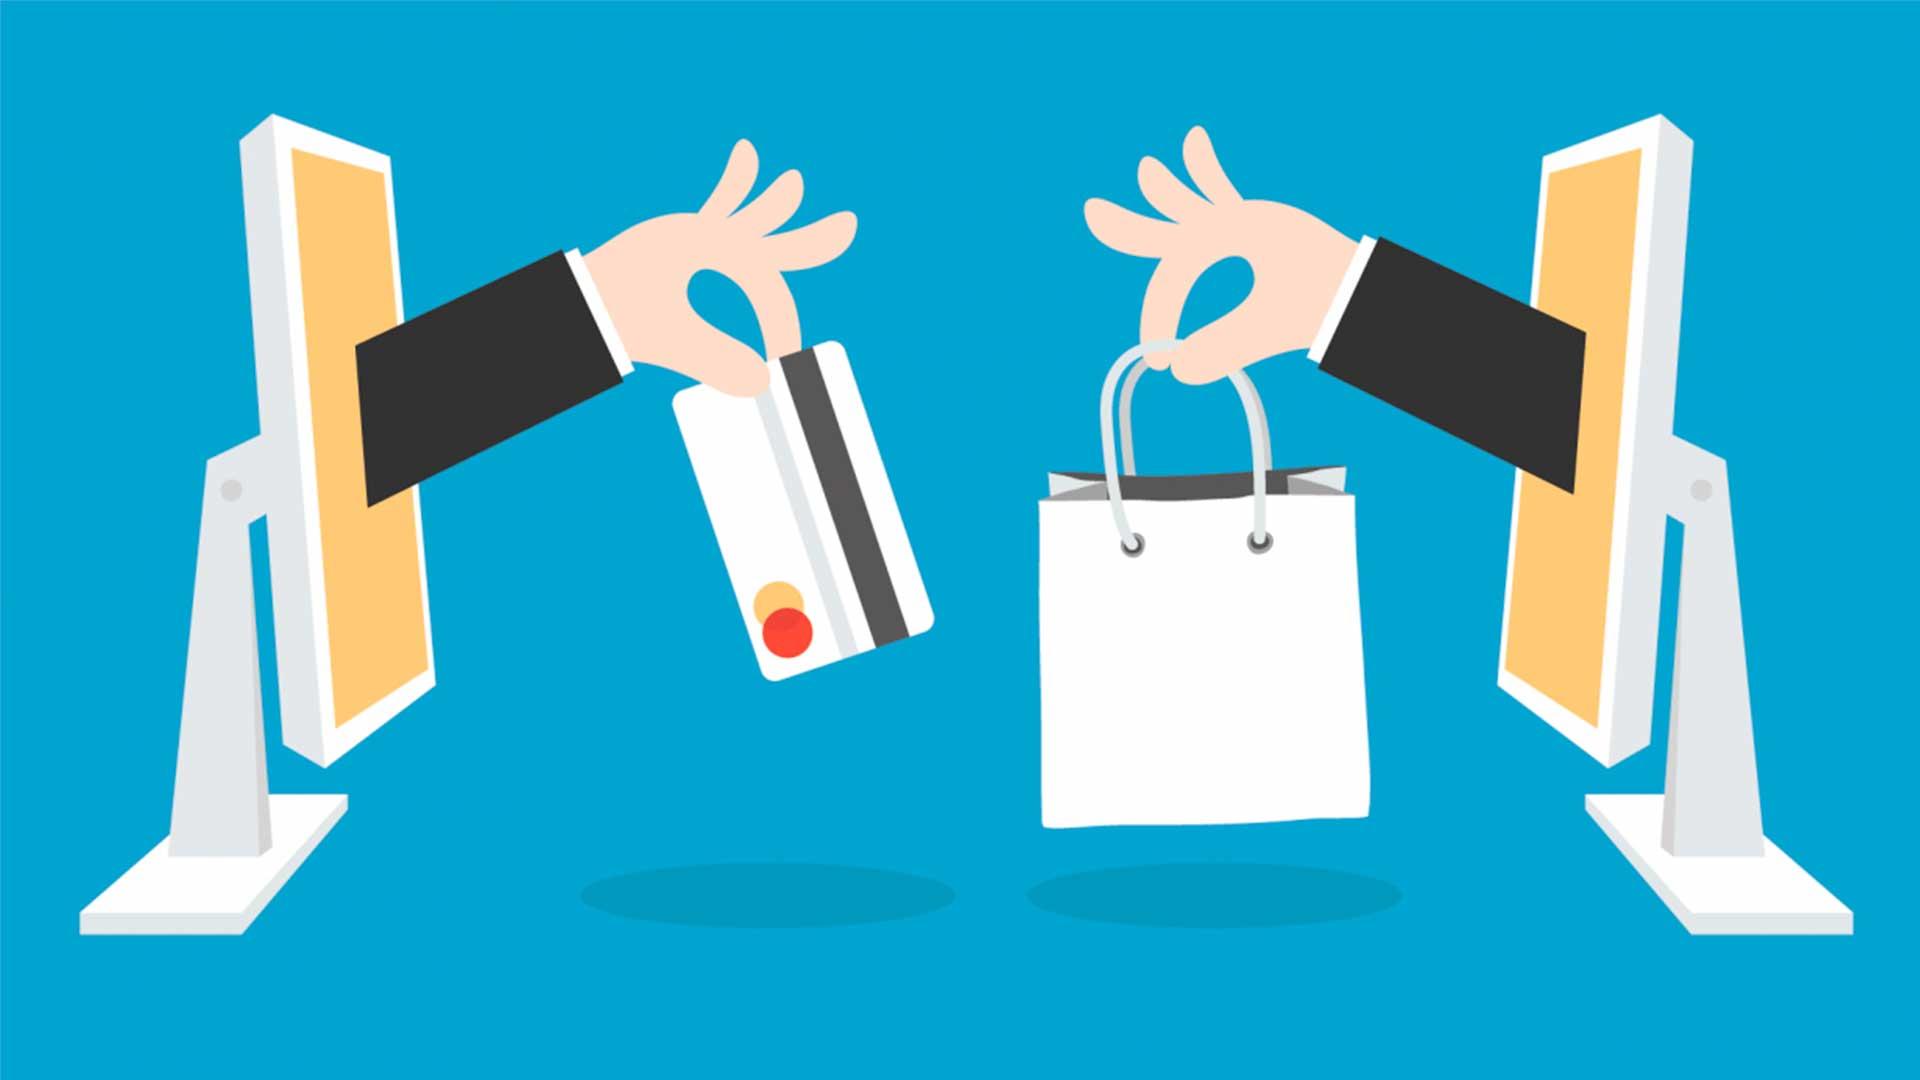 Agencia Sidecar Agencia-Sidecar-blog-negocios-de-exito-miniatura Éxito en tu negocio: triunfar en internet